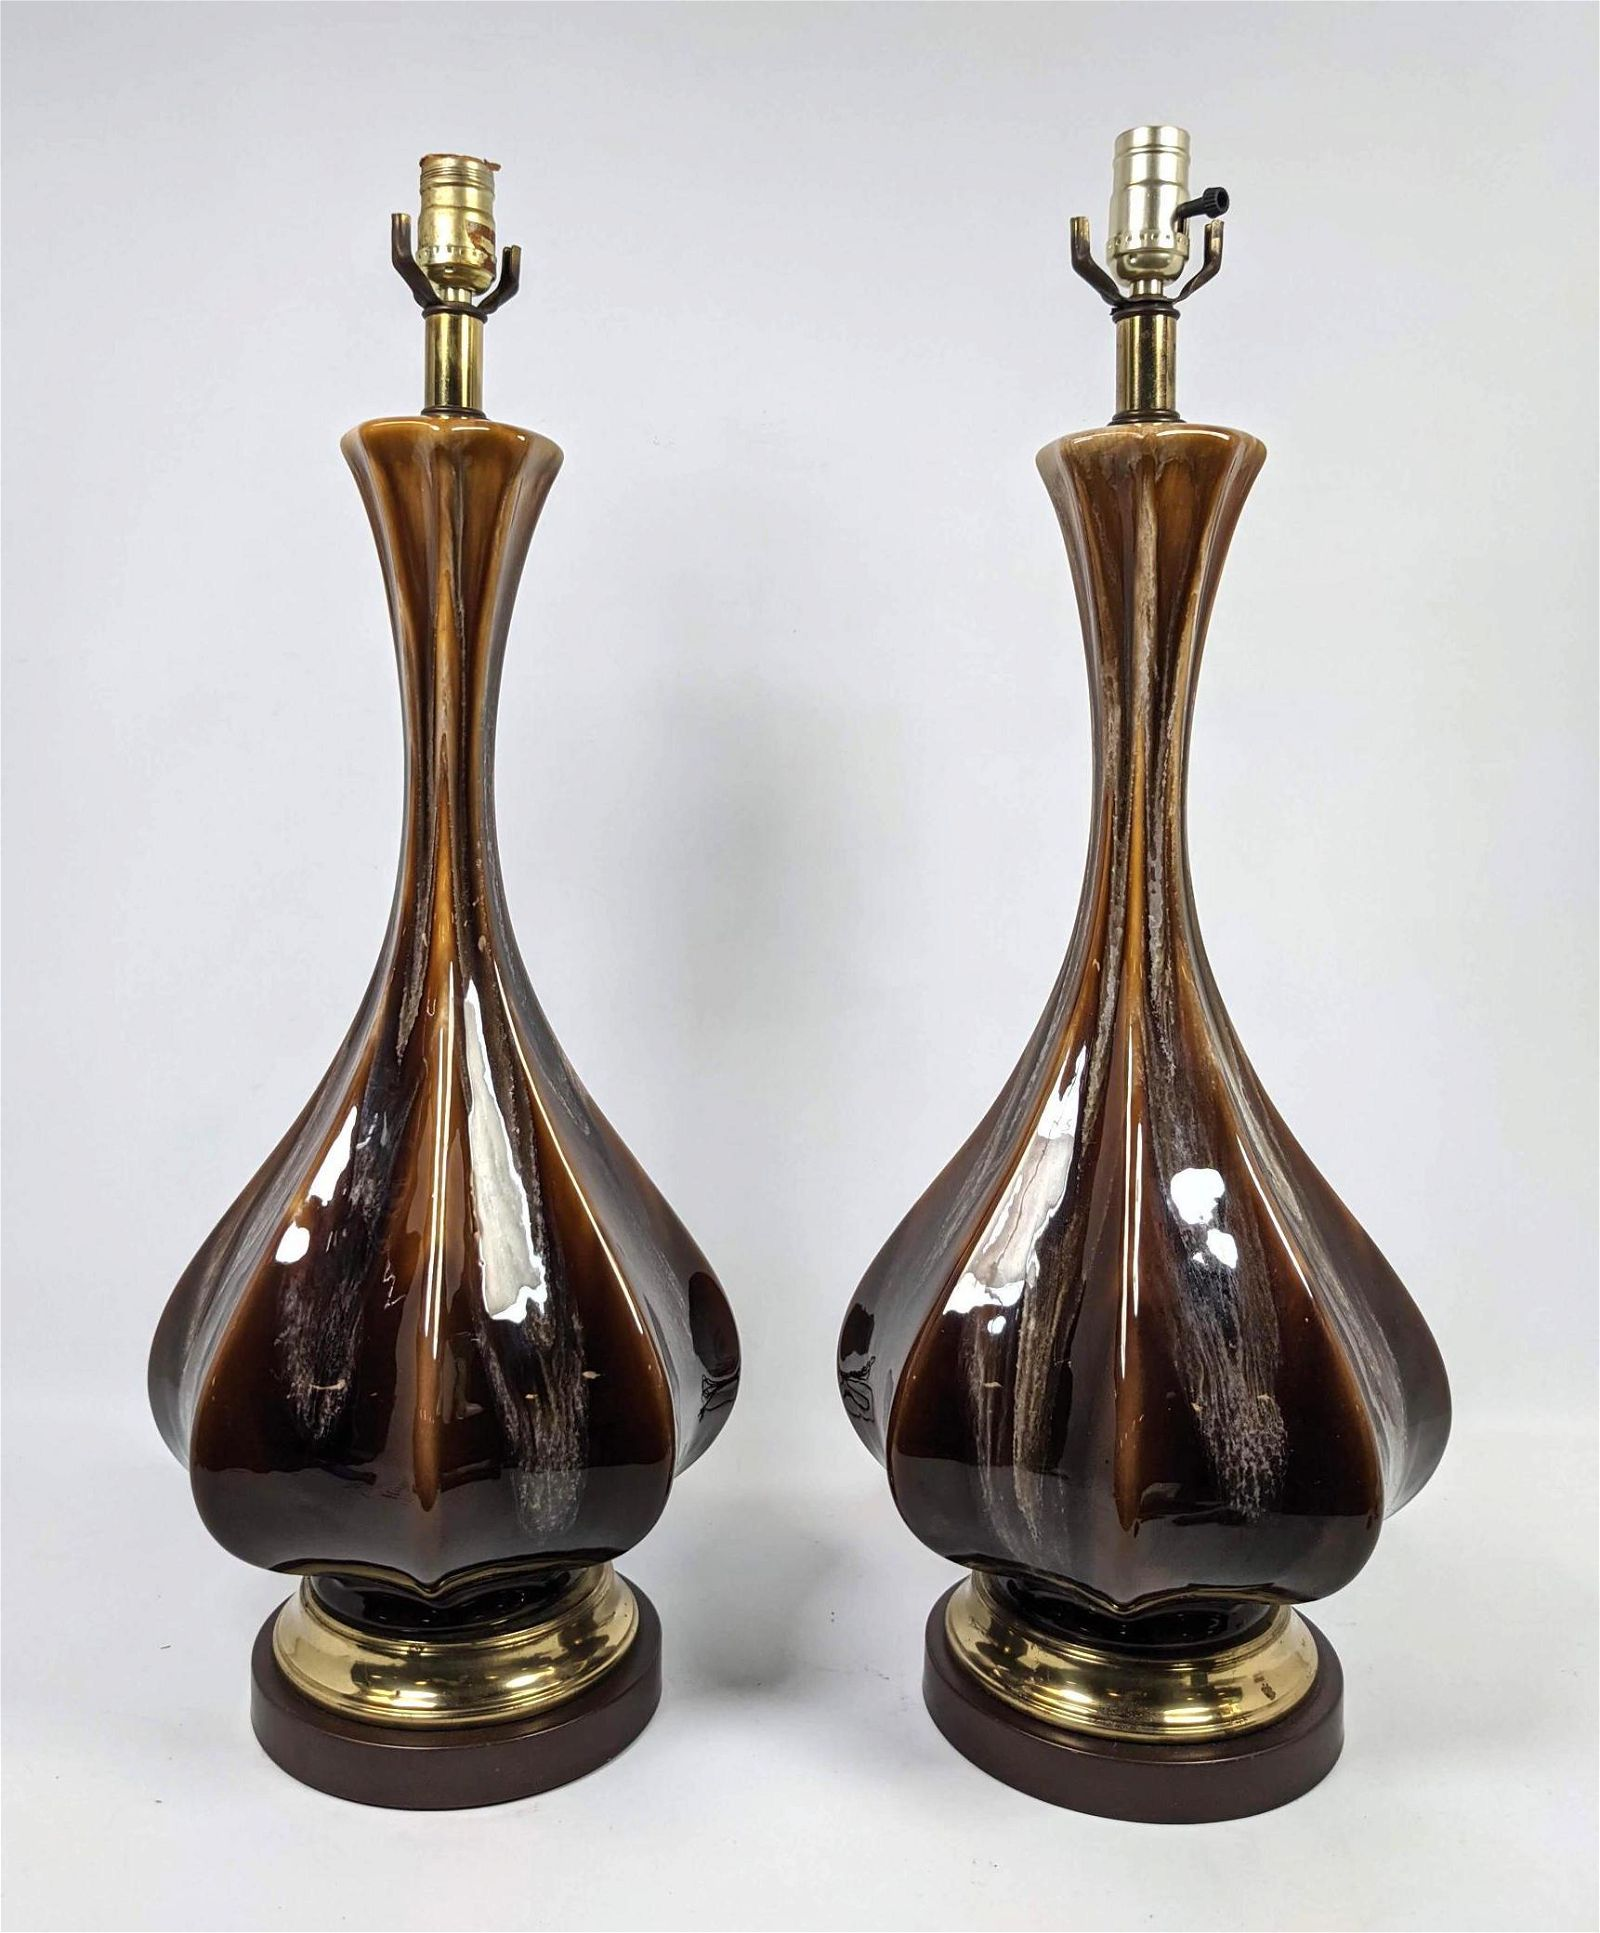 Pr Modernist Glazed Pottery Table Lamps. Brown